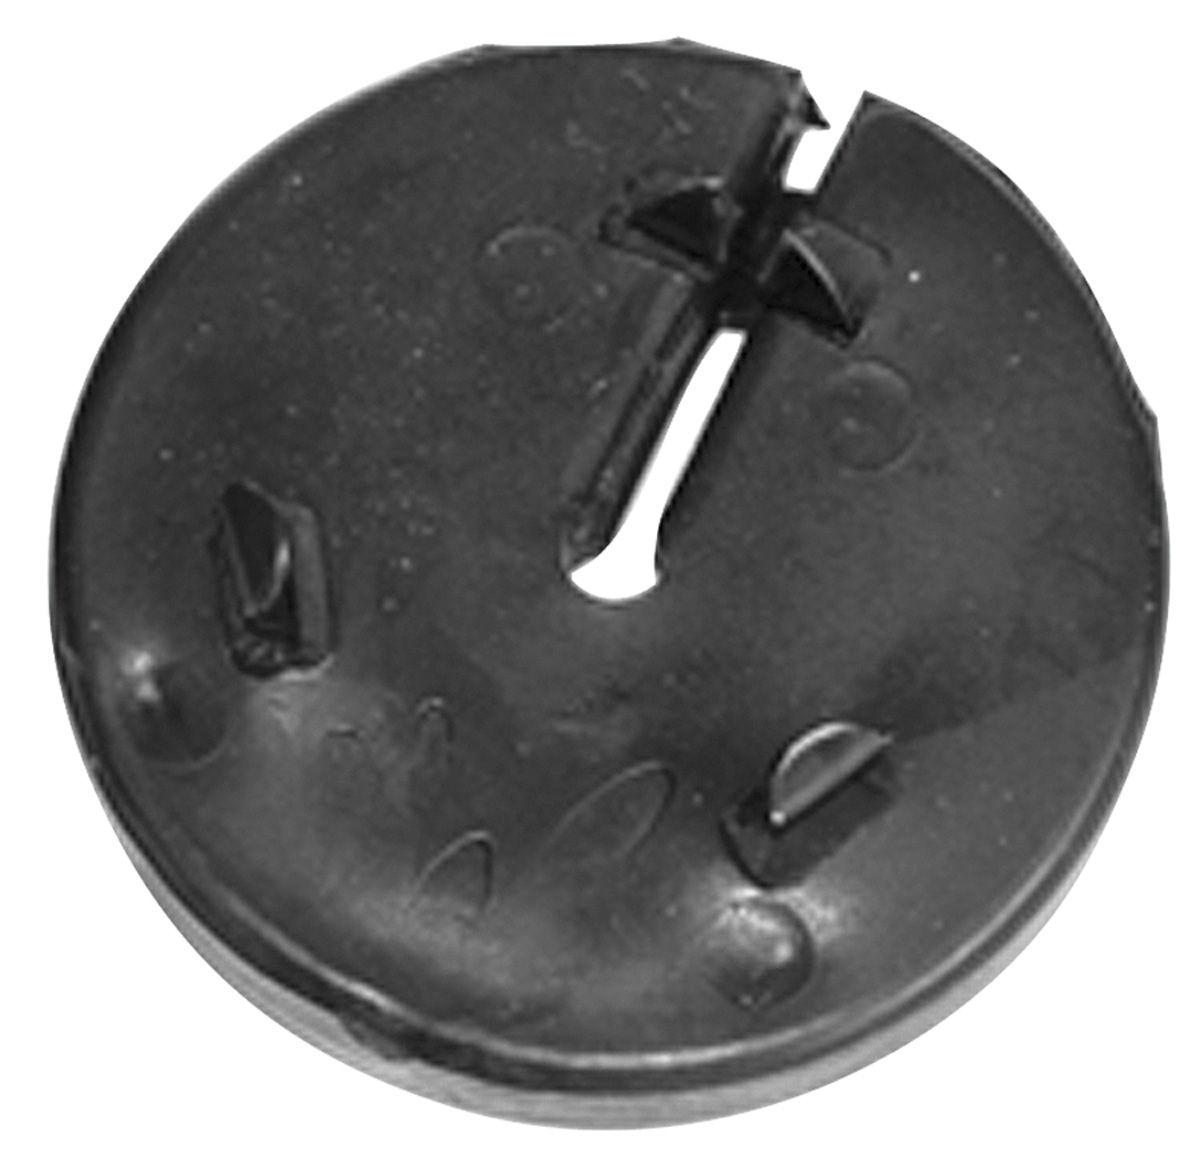 1968-72 Chevelle Trunk Wiring Hardware Wire Grommet @ OPGI.com